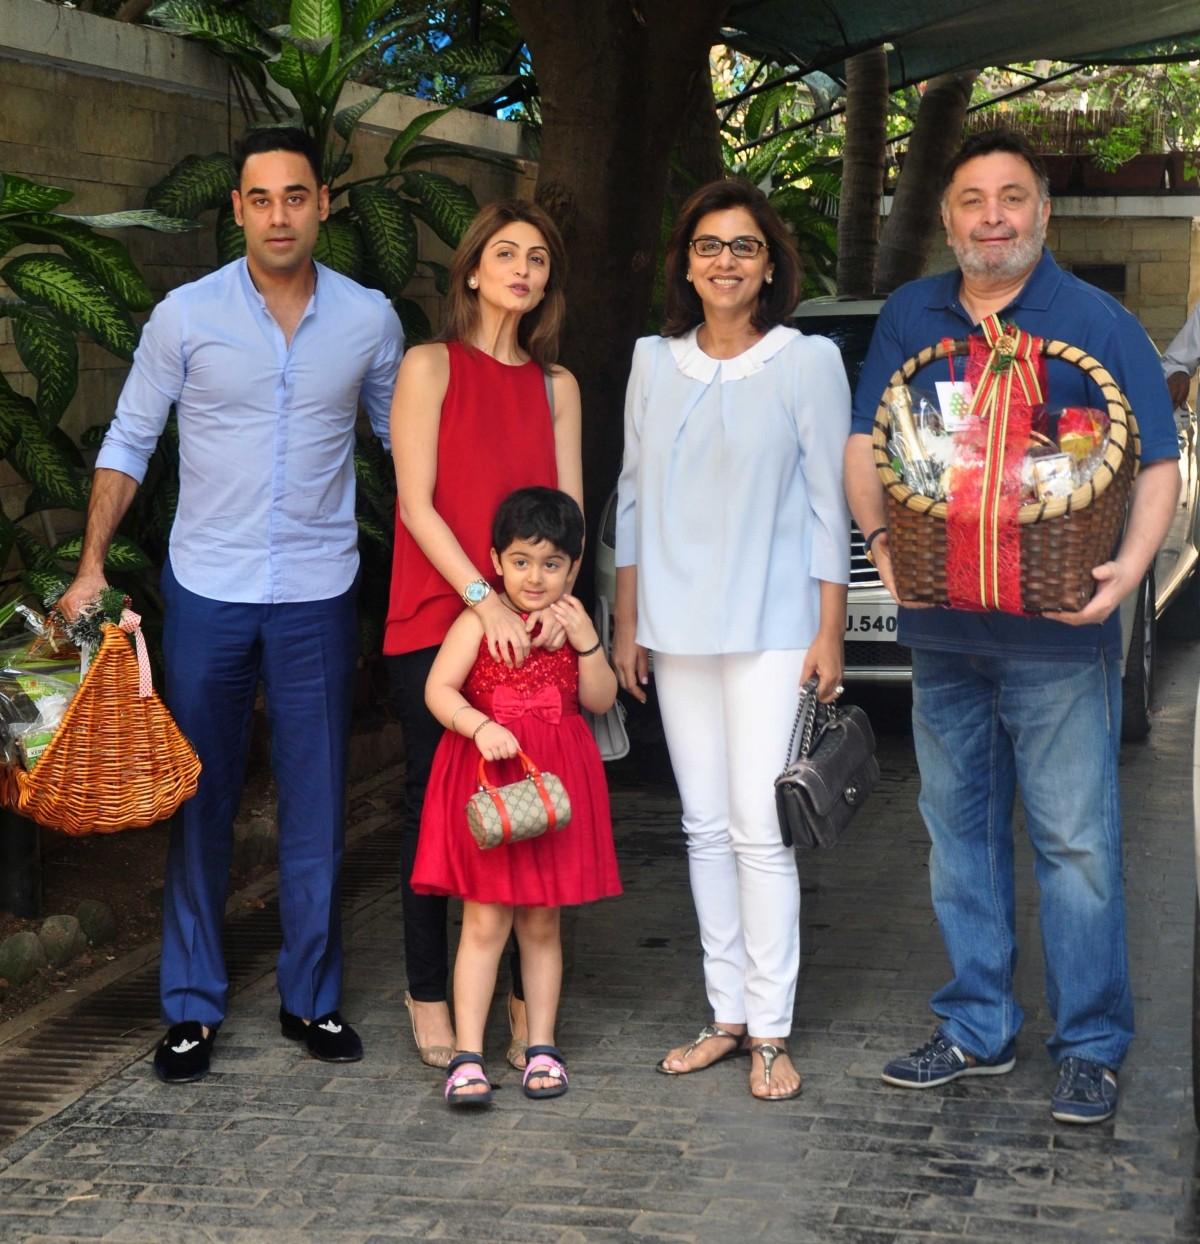 Kapoor Family Under One Roof; Ranbir, Kareena, Karisma attends Annual Christmas Lunch